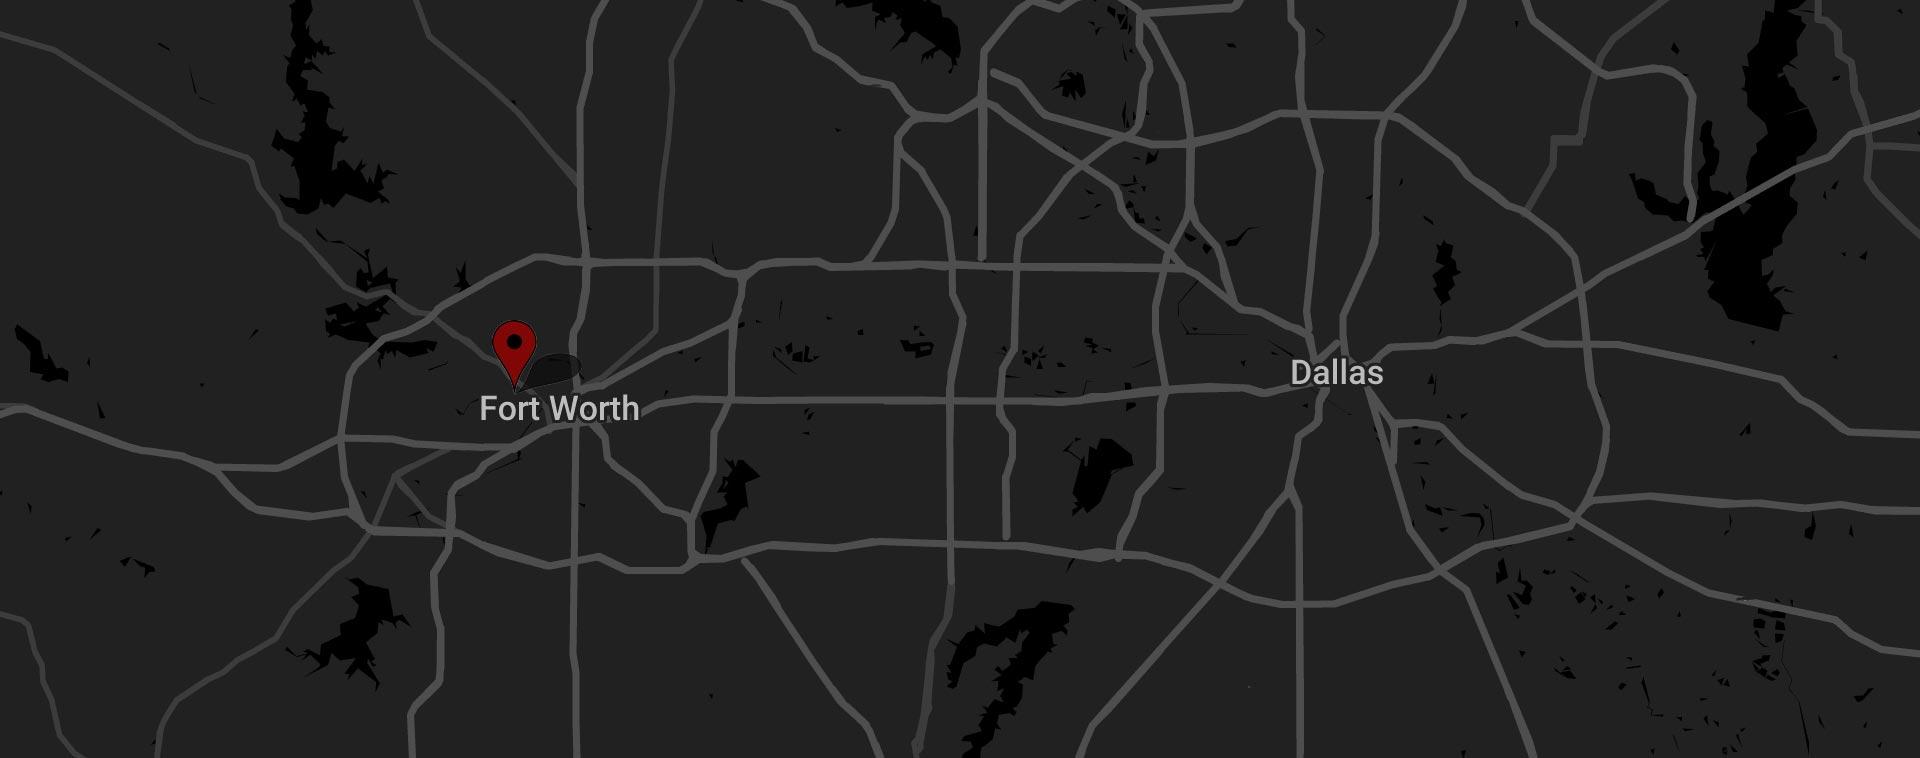 Dallas Fort Worth map